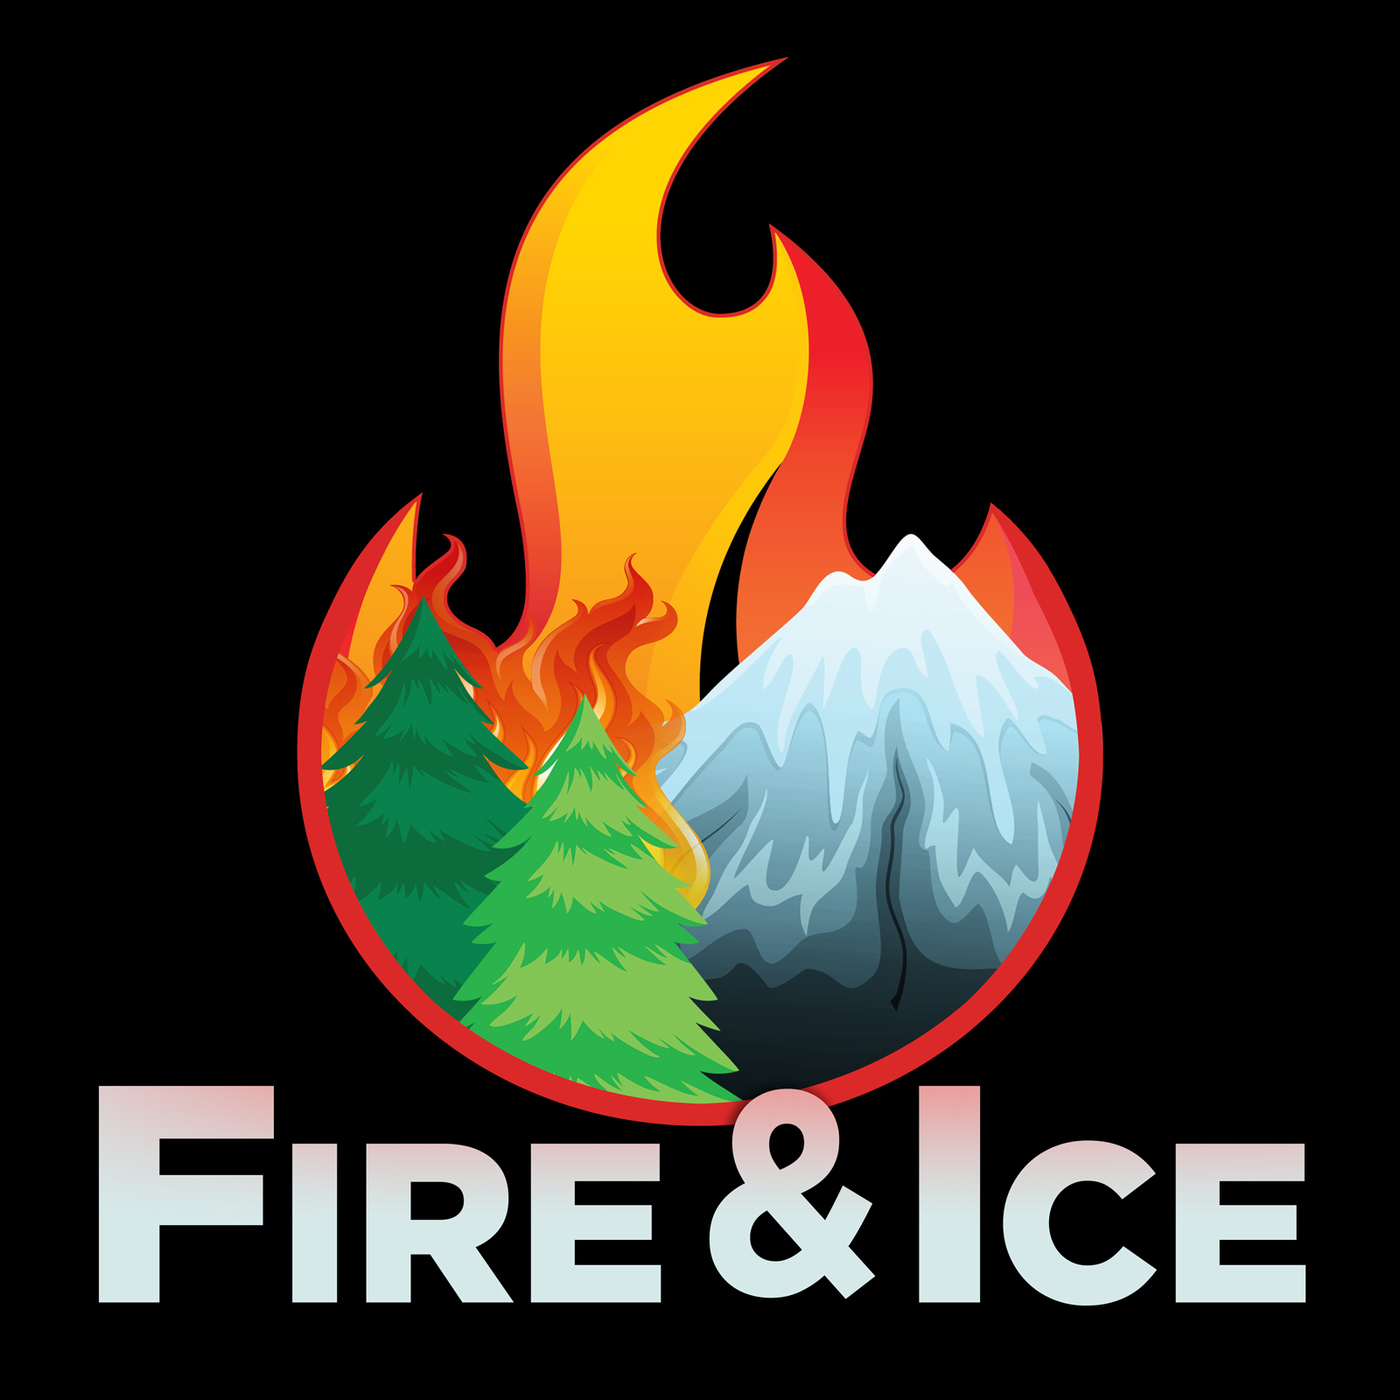 Fire & Ice | Listen via Stitcher for Podcasts